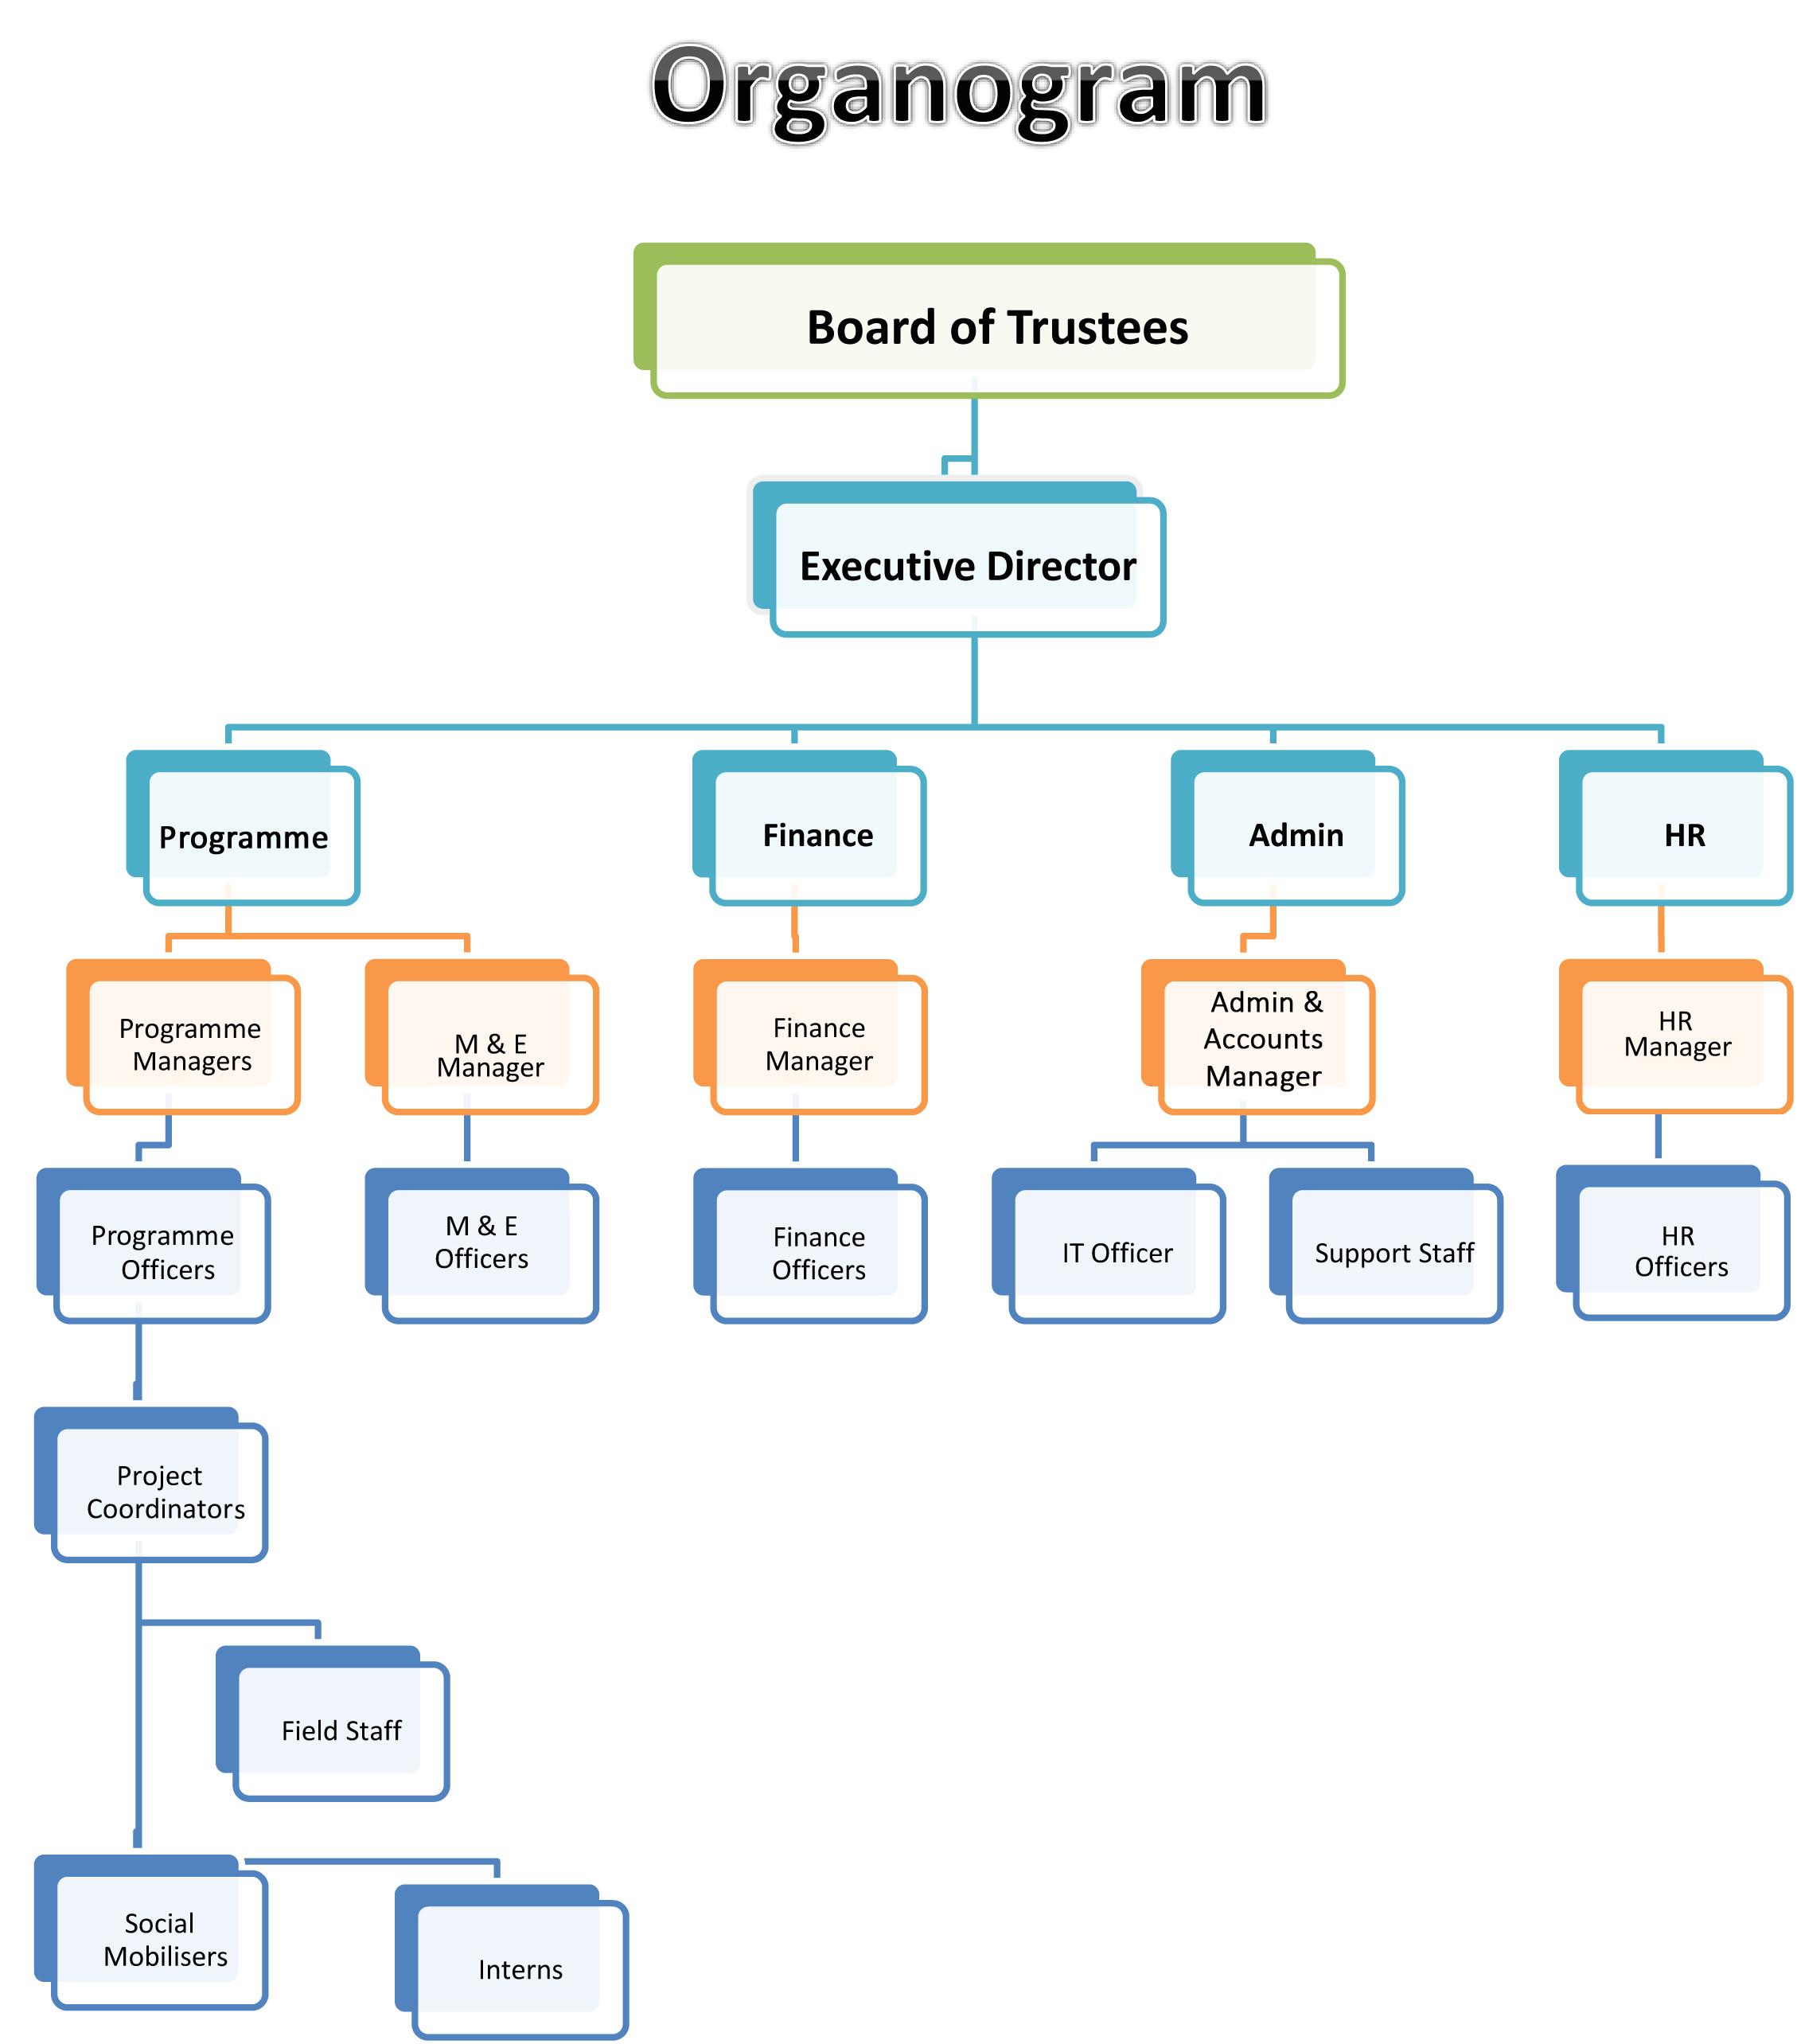 29 images of templates organogram download 5599